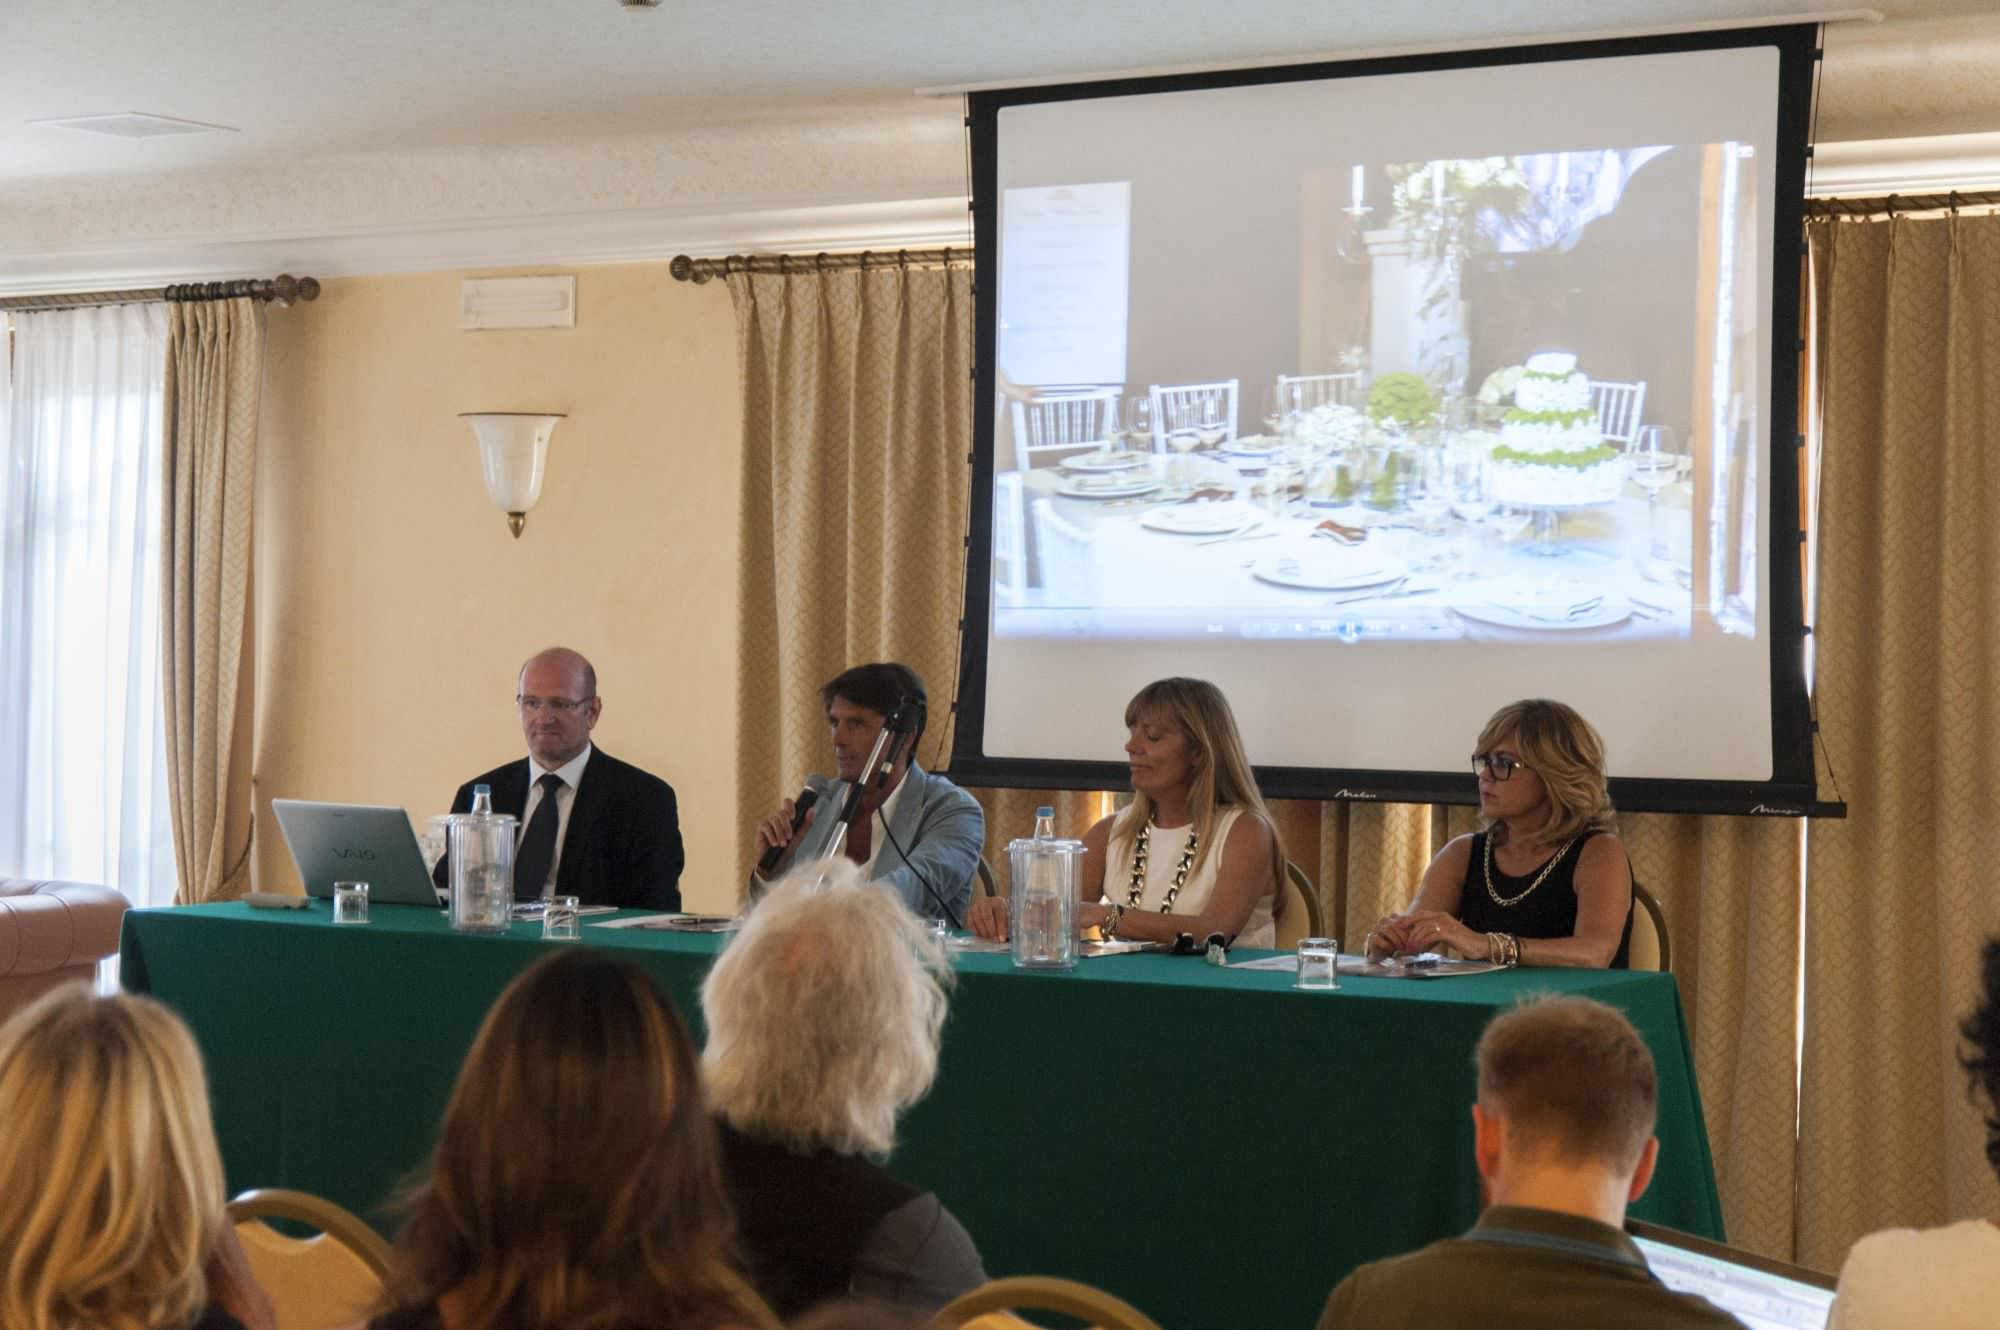 Villa Ariston apre le porte a Versilia Wedding, la fiera dedicata agli sposi